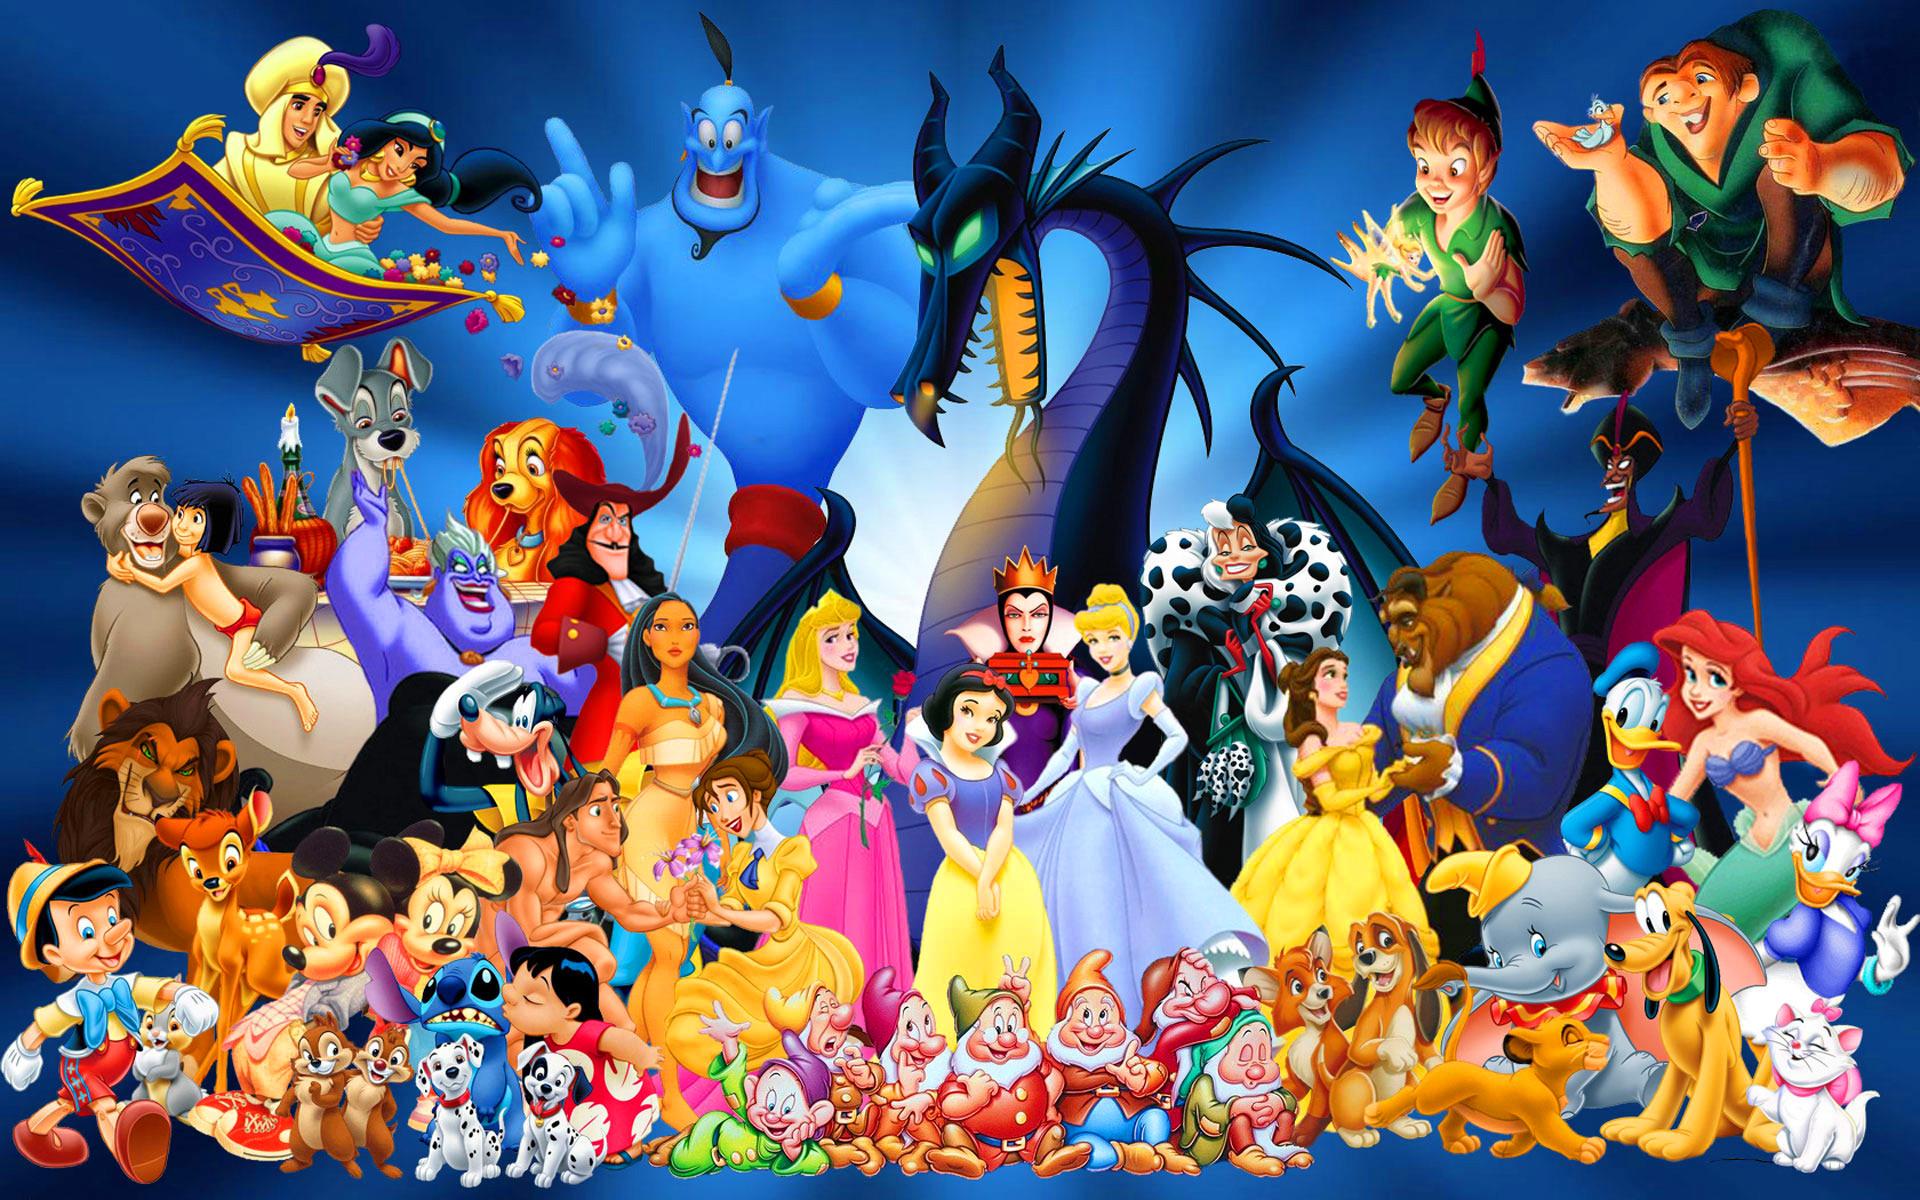 Disney Cartoon Characters computer desktop wallpaper 1920x1200